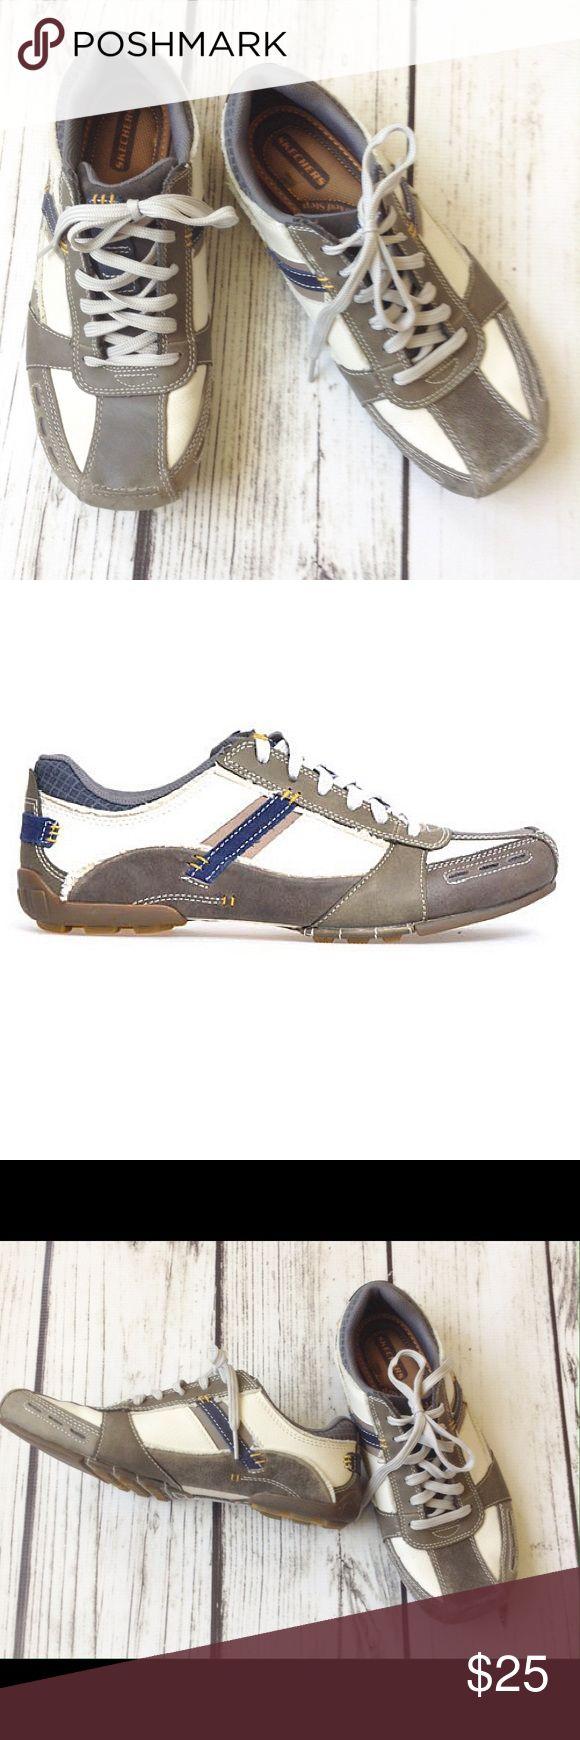 💁🏻♂️HP Men's Style💁🏻♂️ EUC men's casual tennis shoes Skechers Shoes Sneakers